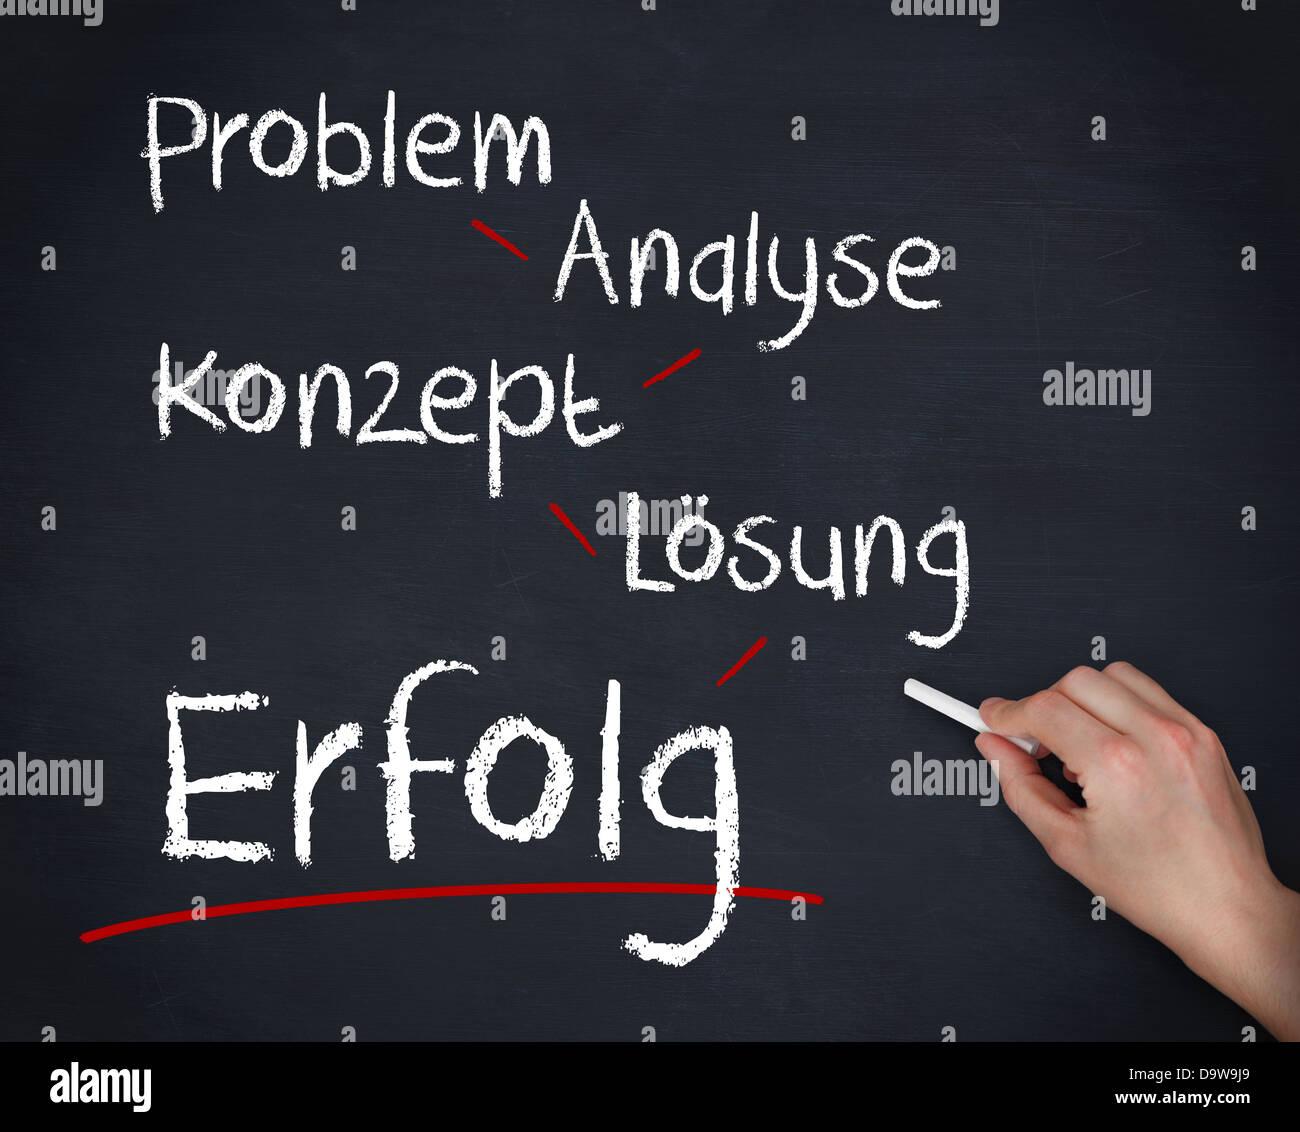 Handschrift Problem, analyse, Konzept, Solucao und erfolg Stockbild